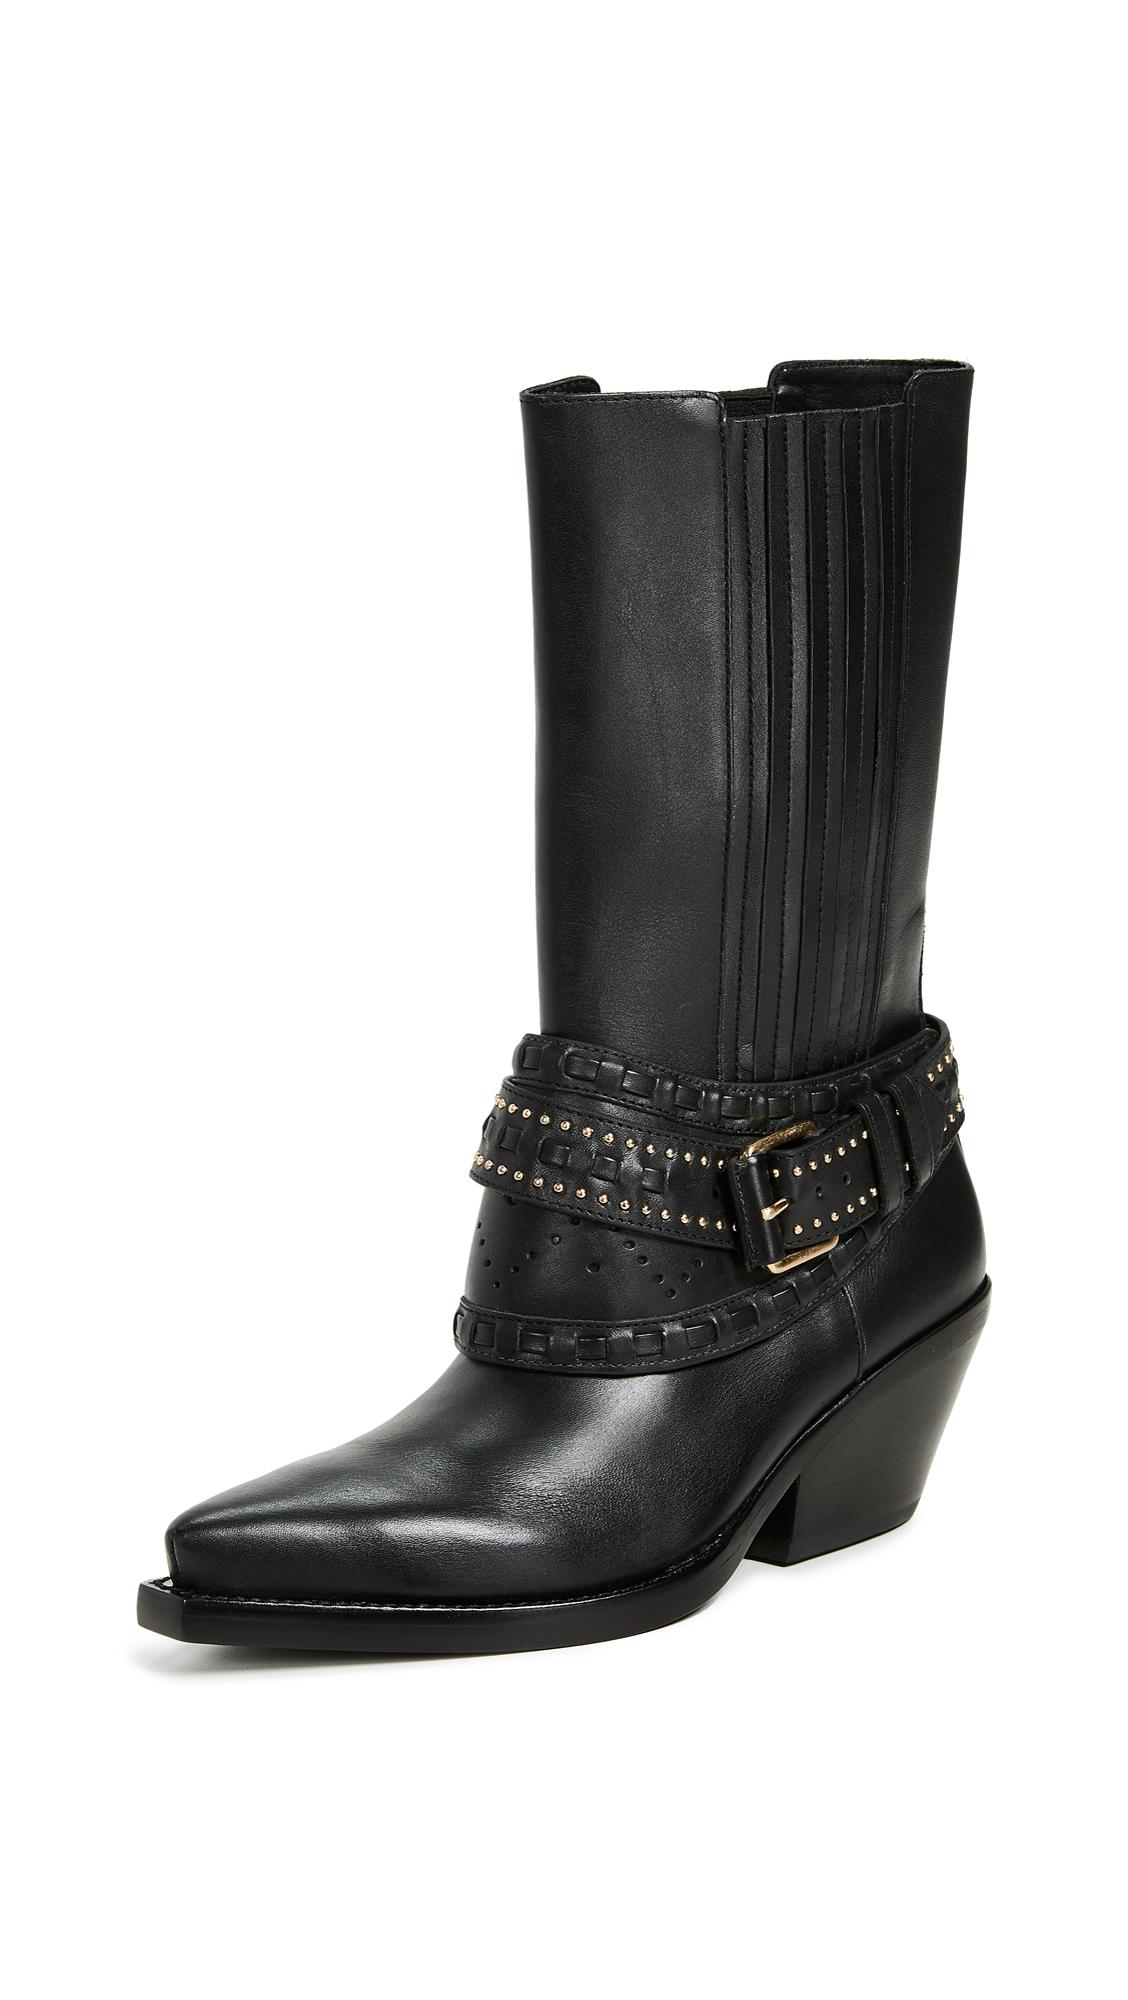 Zimmermann Cowboy Mid Calf Boots - Black